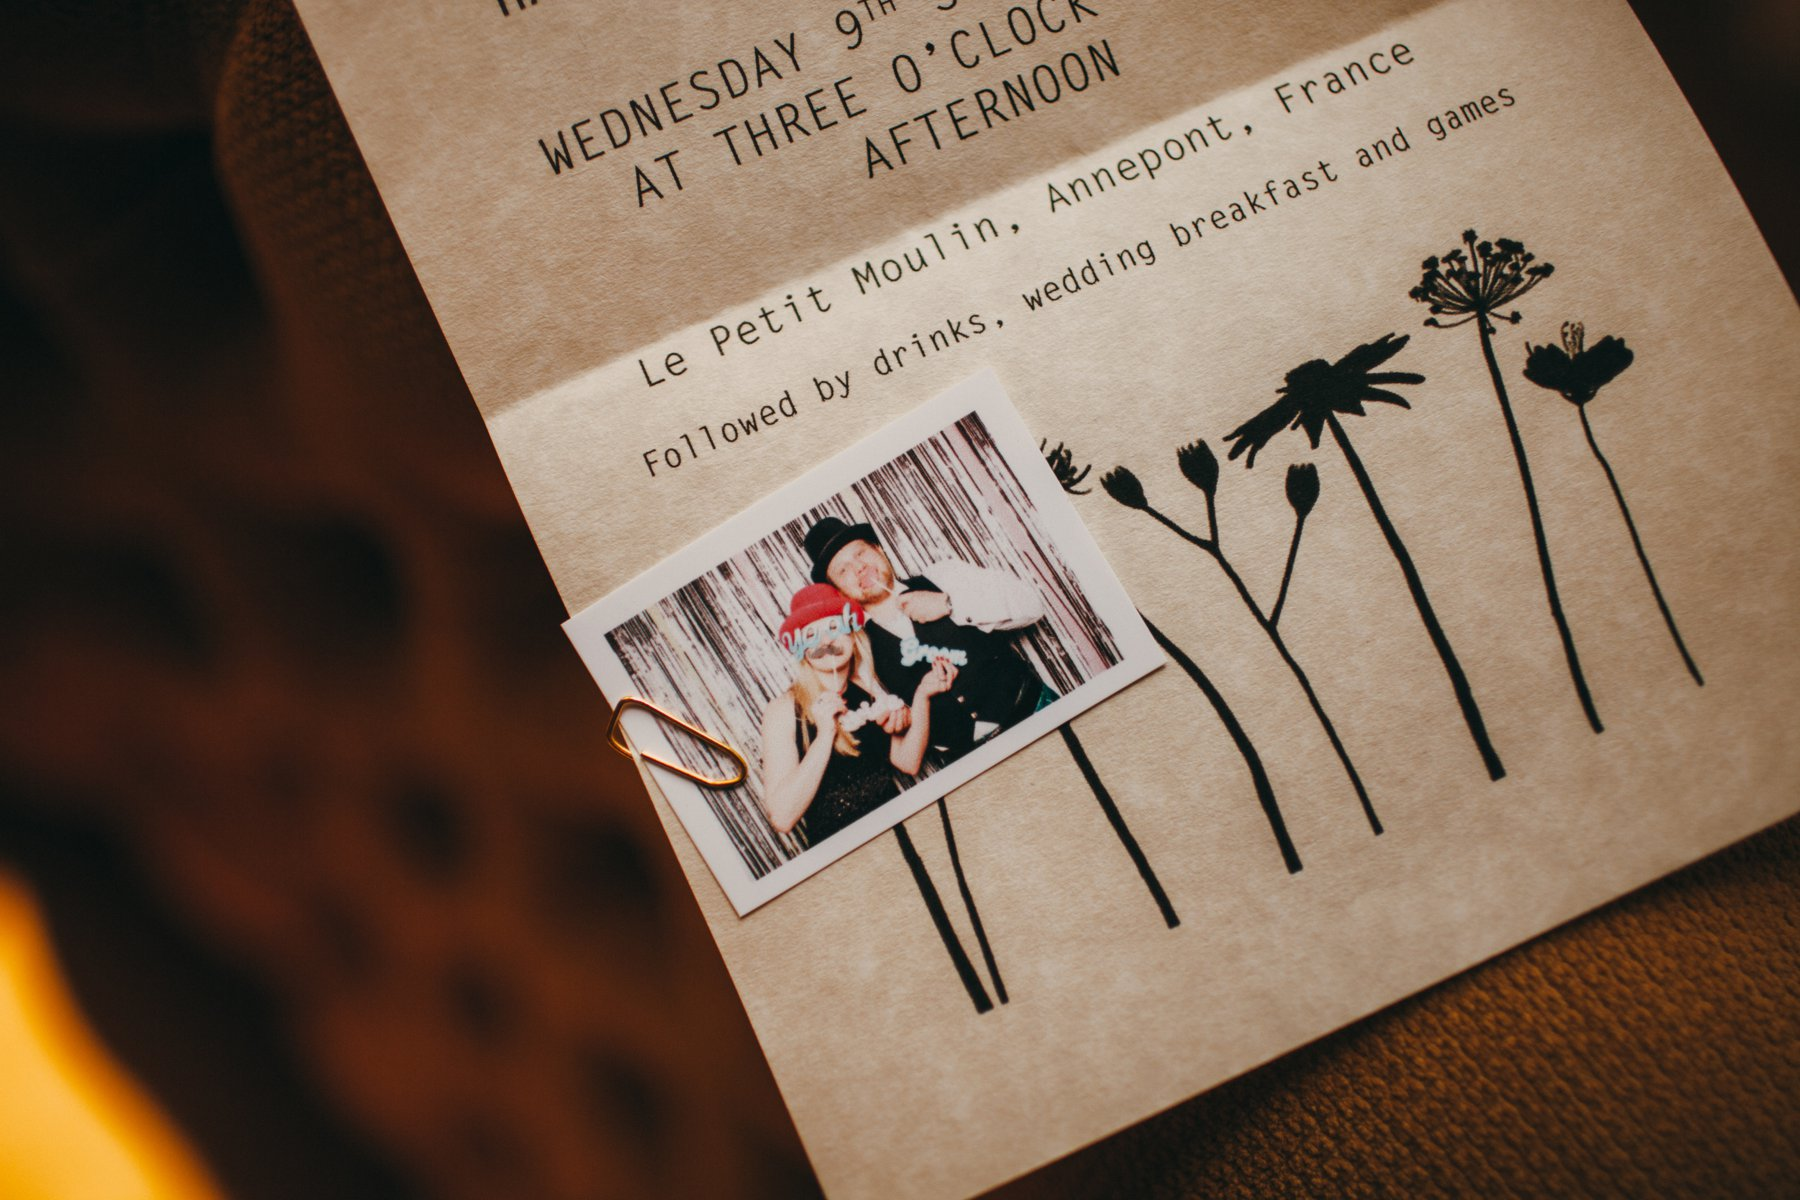 petitmoulin_france_bordeaux_weddings_0002